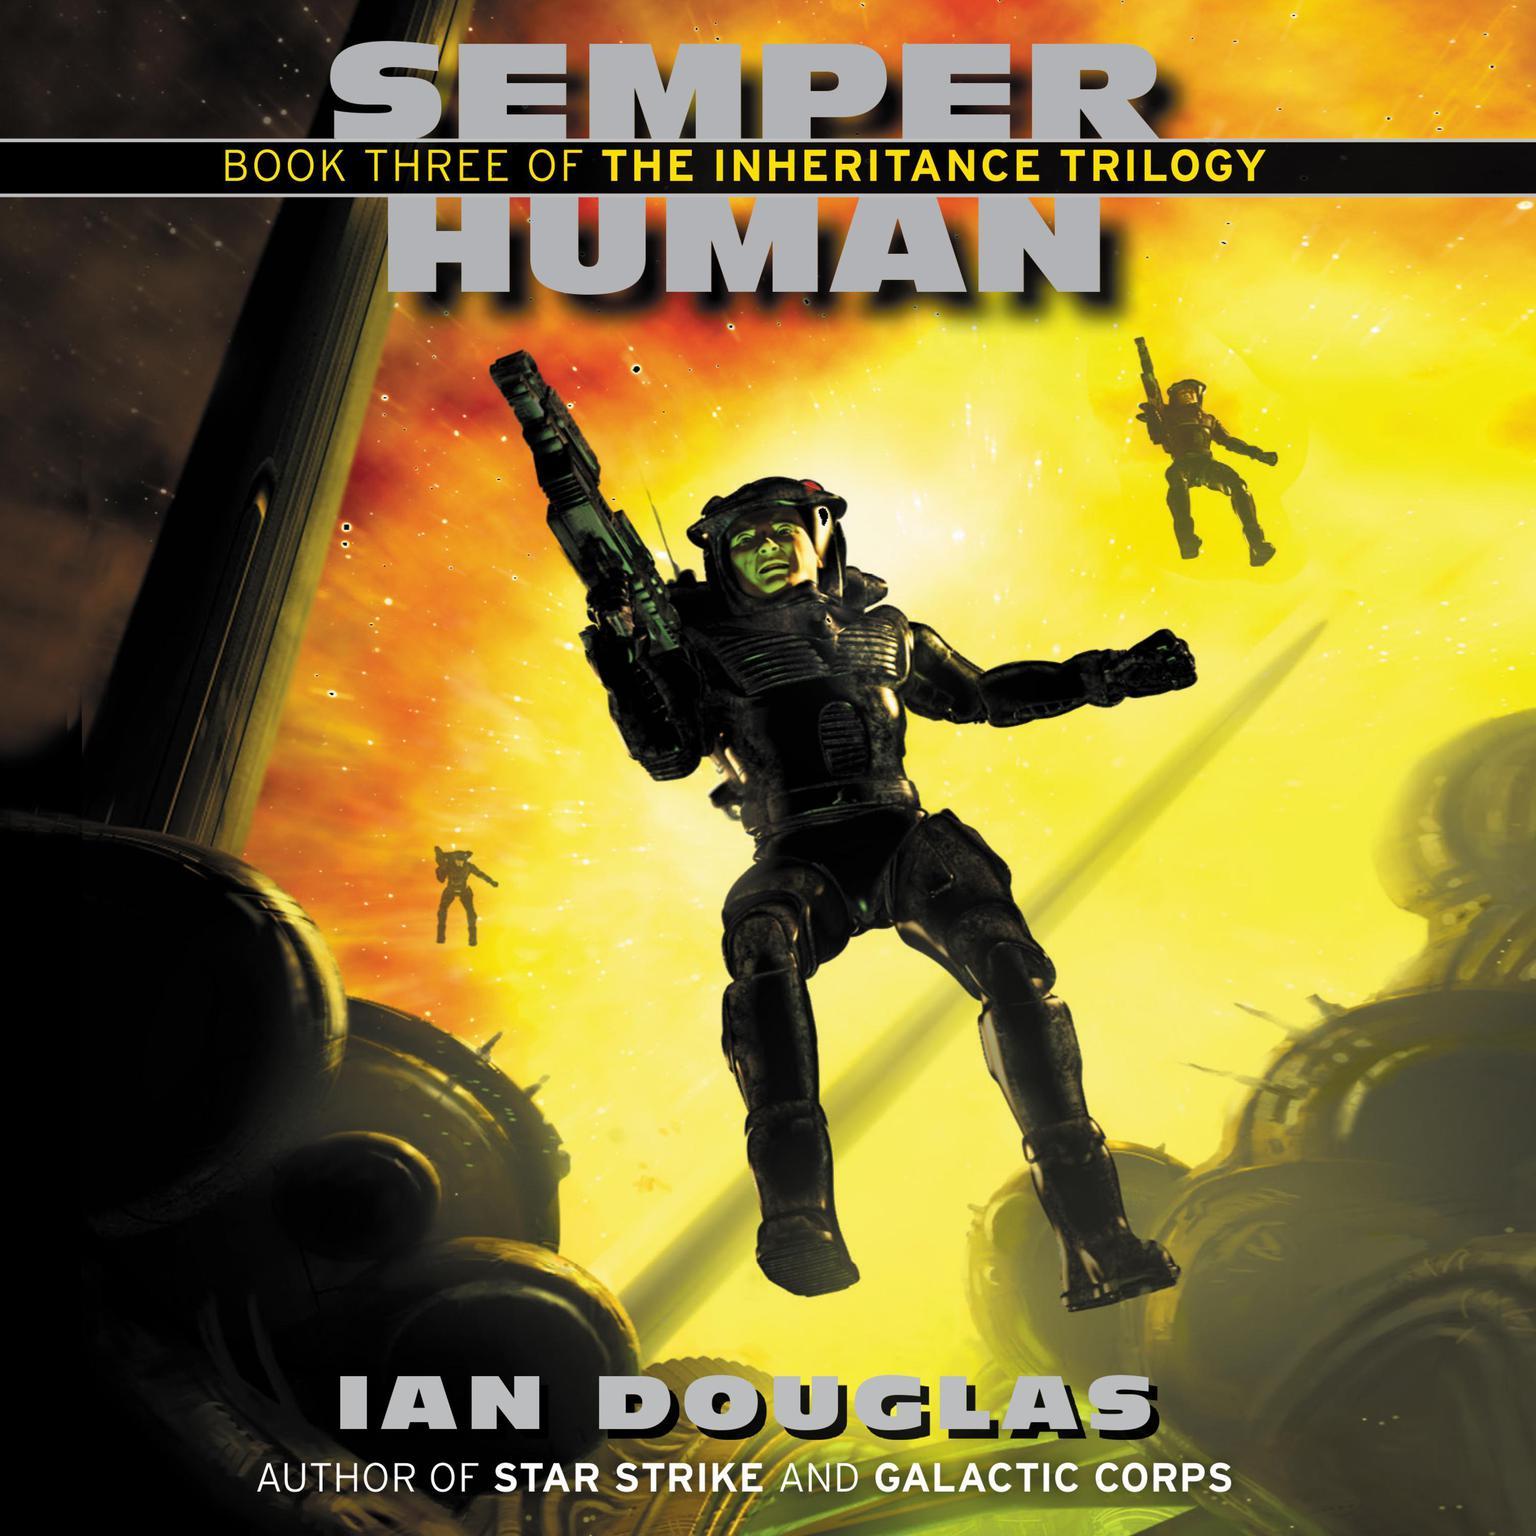 Semper Human: Book Three of the Inheritance Trilogy Audiobook, by Ian Douglas